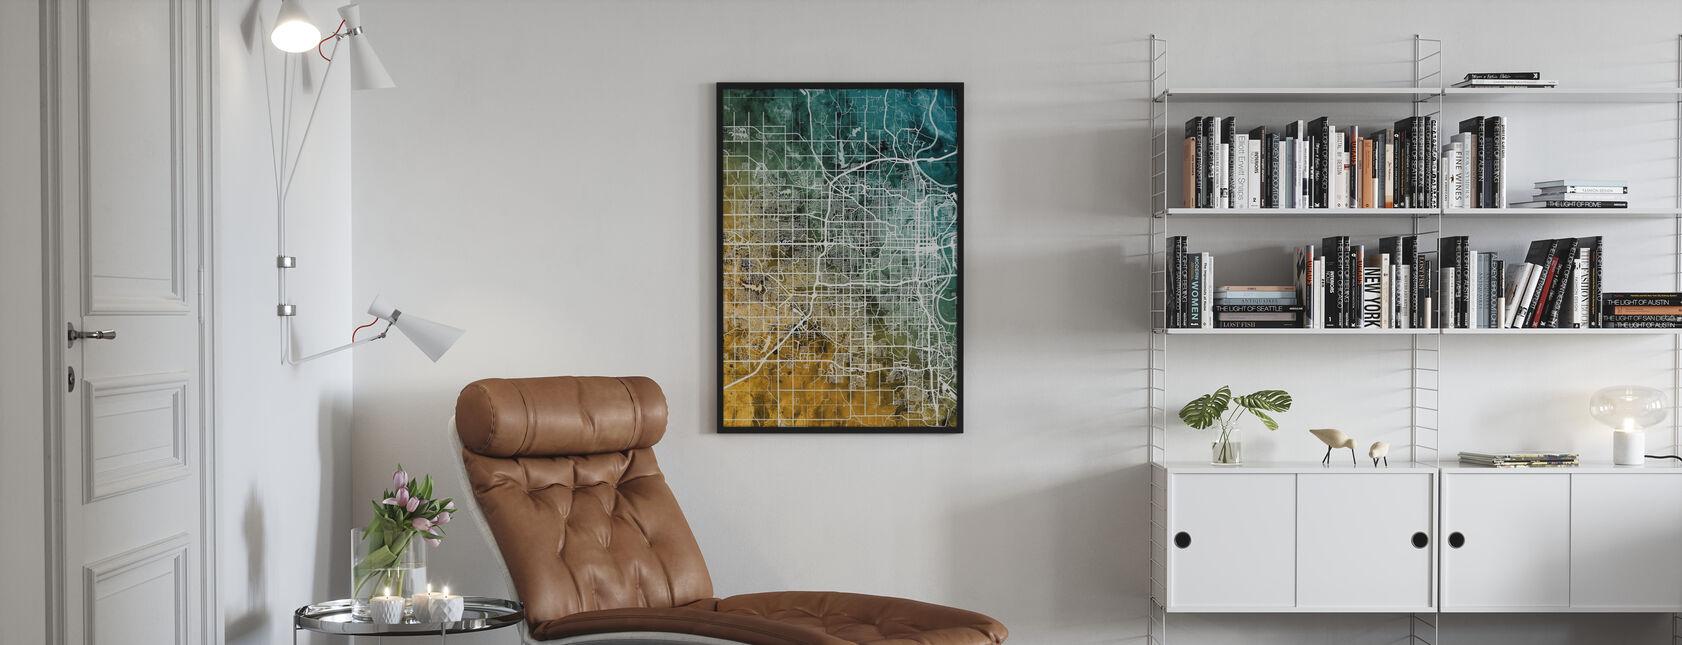 Omaha Nebraska City Kort - Plakat - Stue